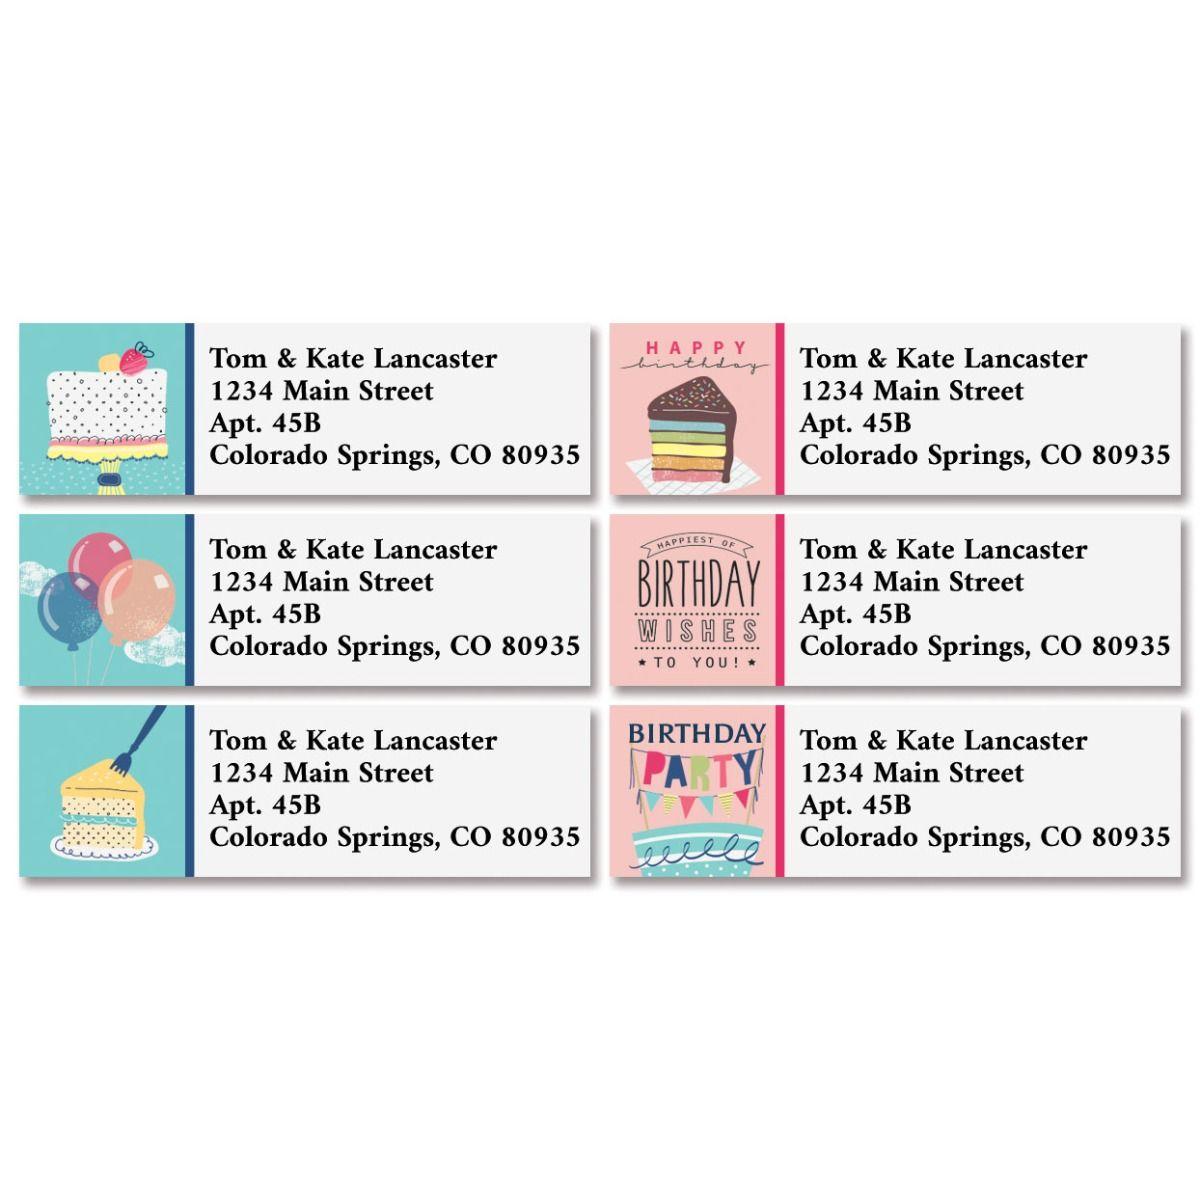 Birthday Party Classic Return Address Labels (6 Designs)